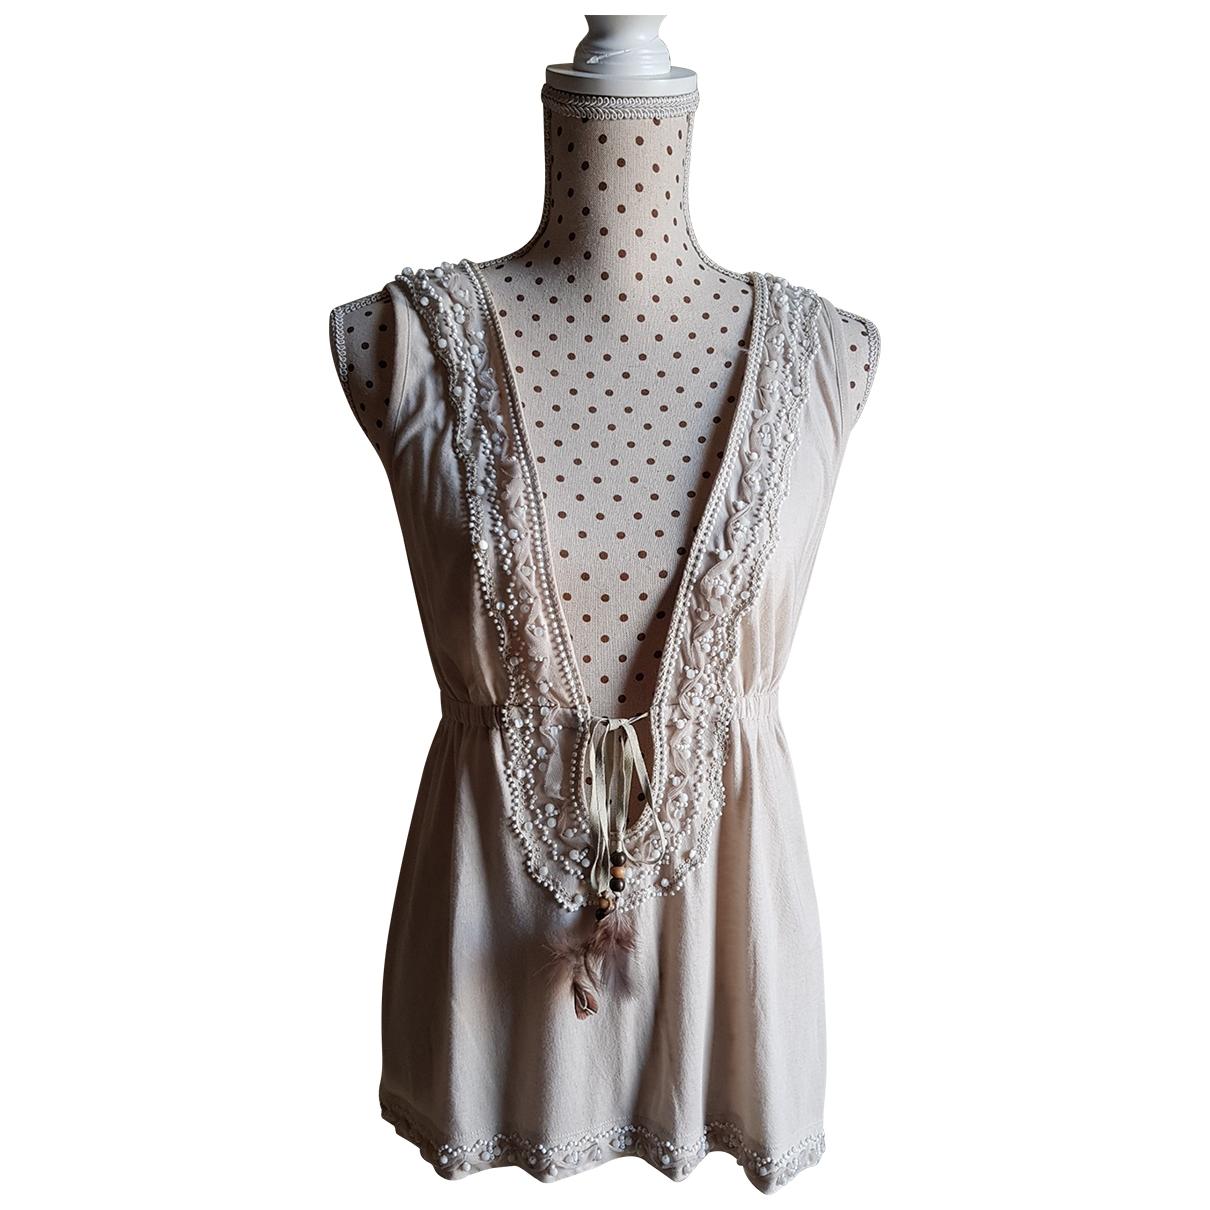 D&g \N Beige Cotton  top for Women 44 IT